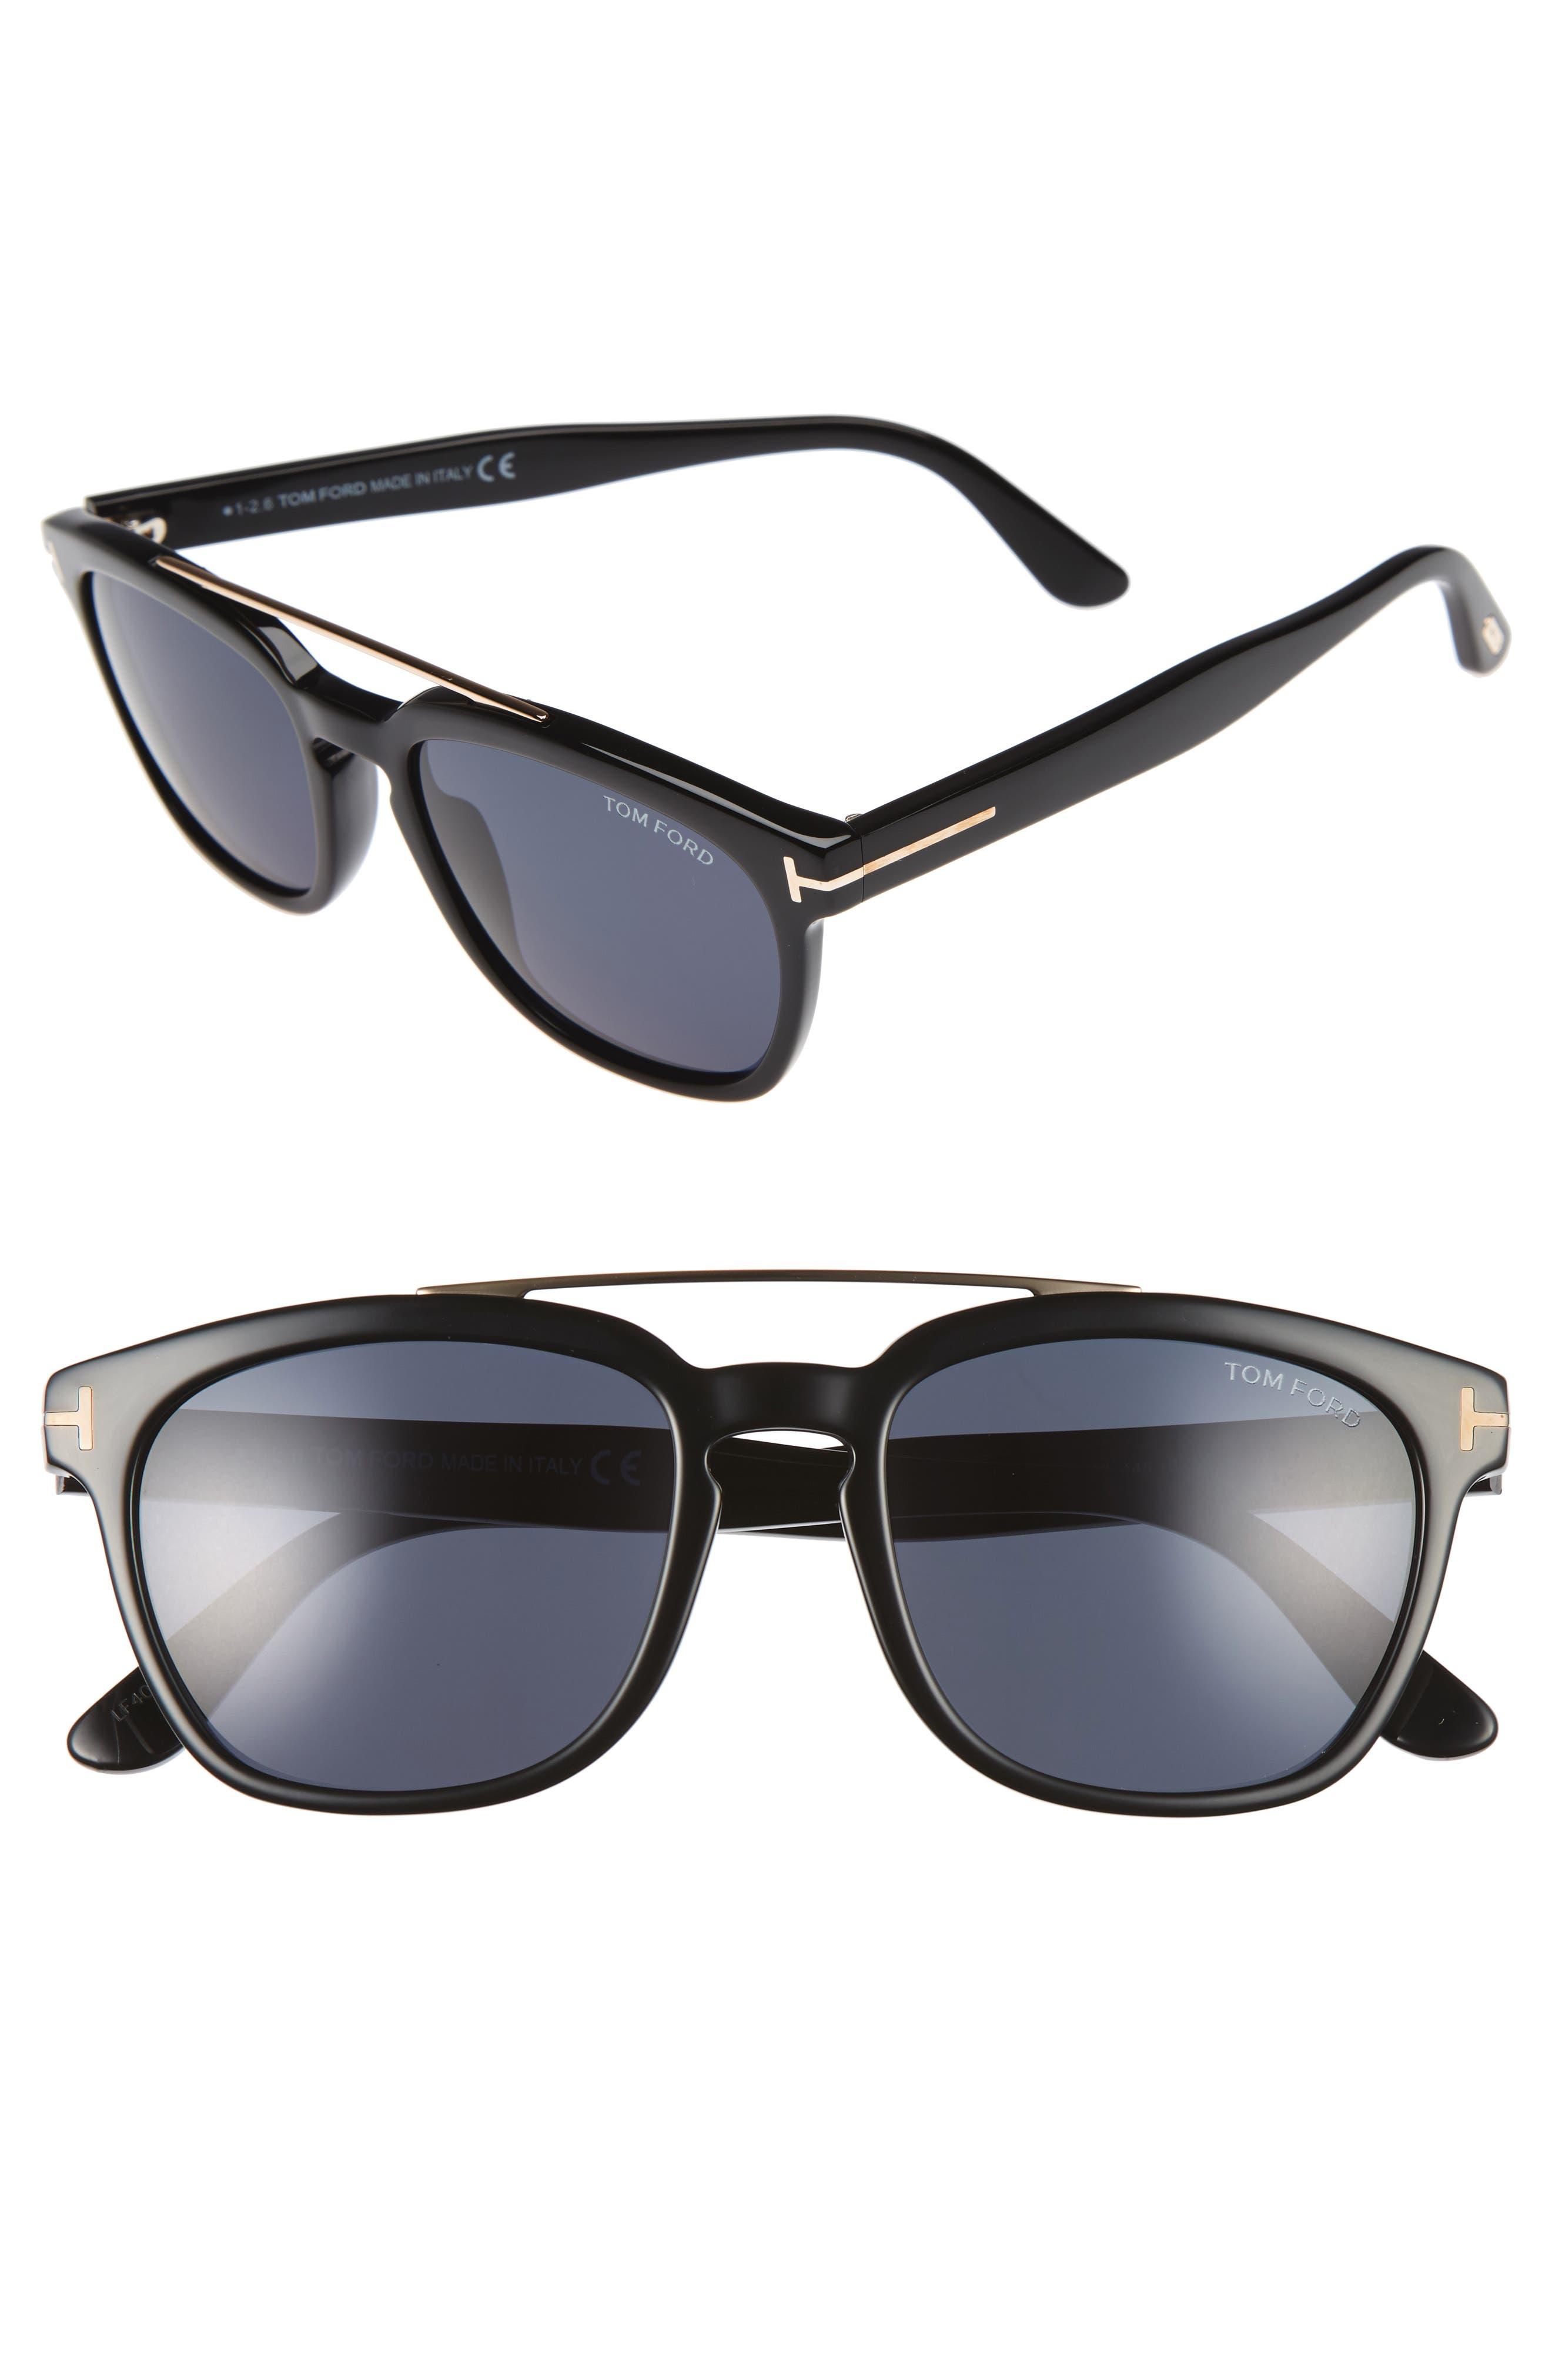 TOM FORD, Holt 54mm Sunglasses, Main thumbnail 1, color, 018